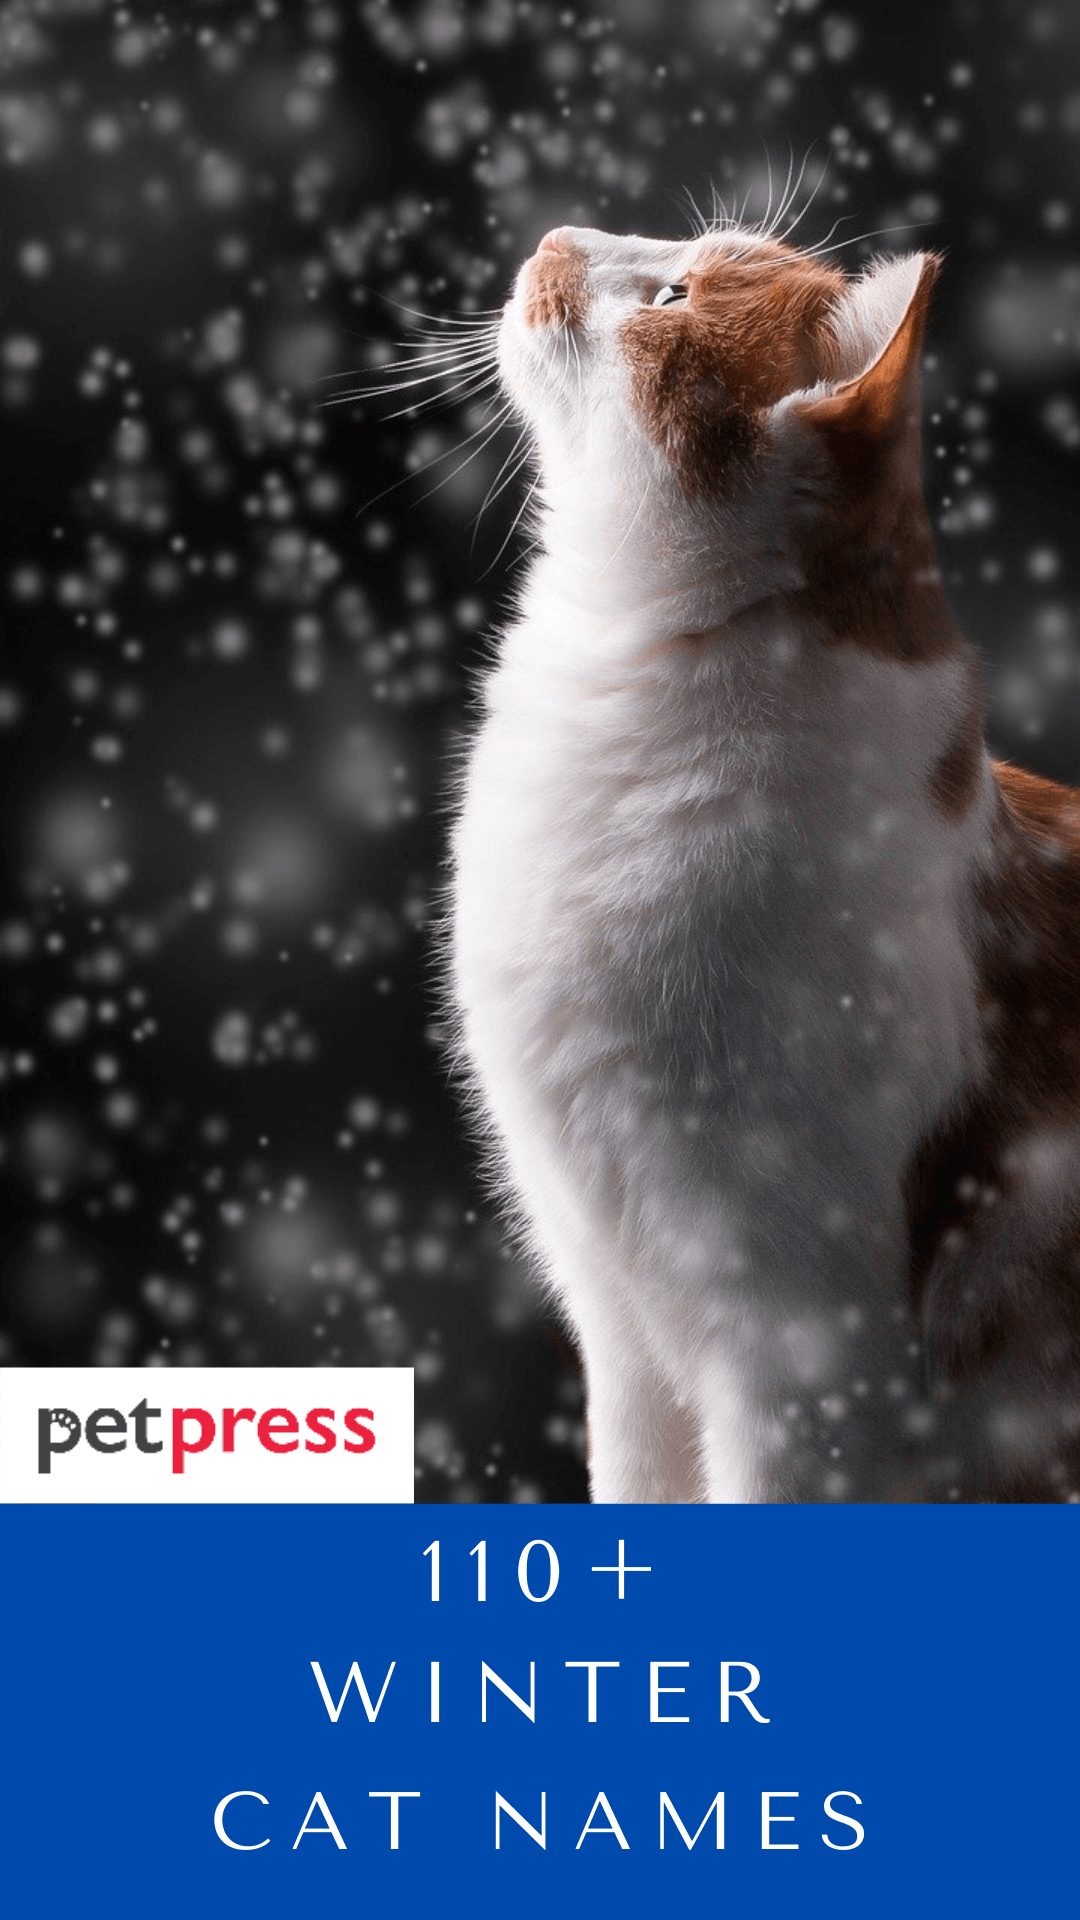 winter-cat-names